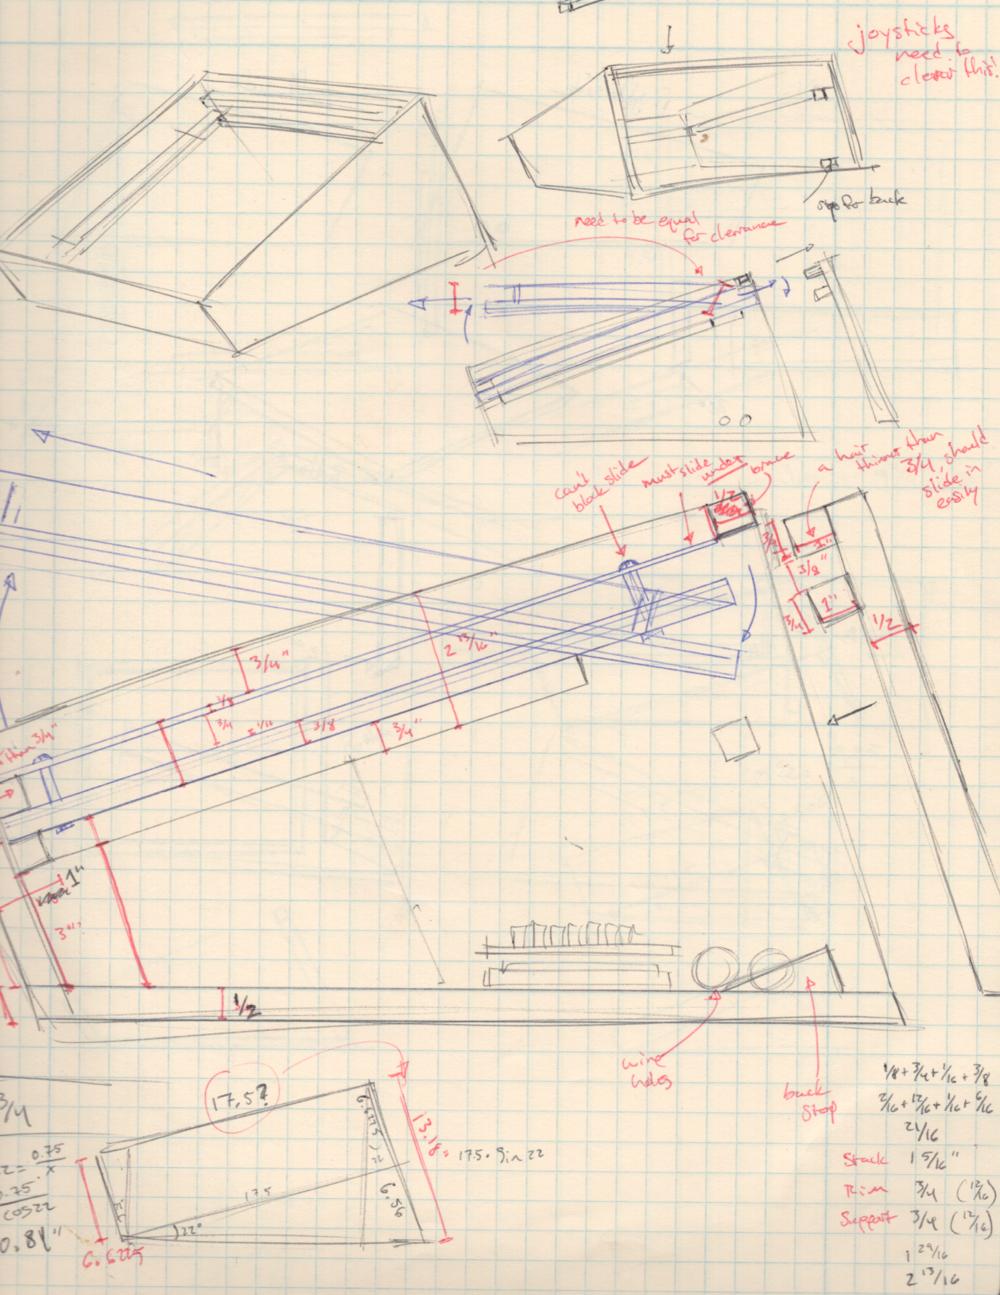 Joytone Sketches 4.png